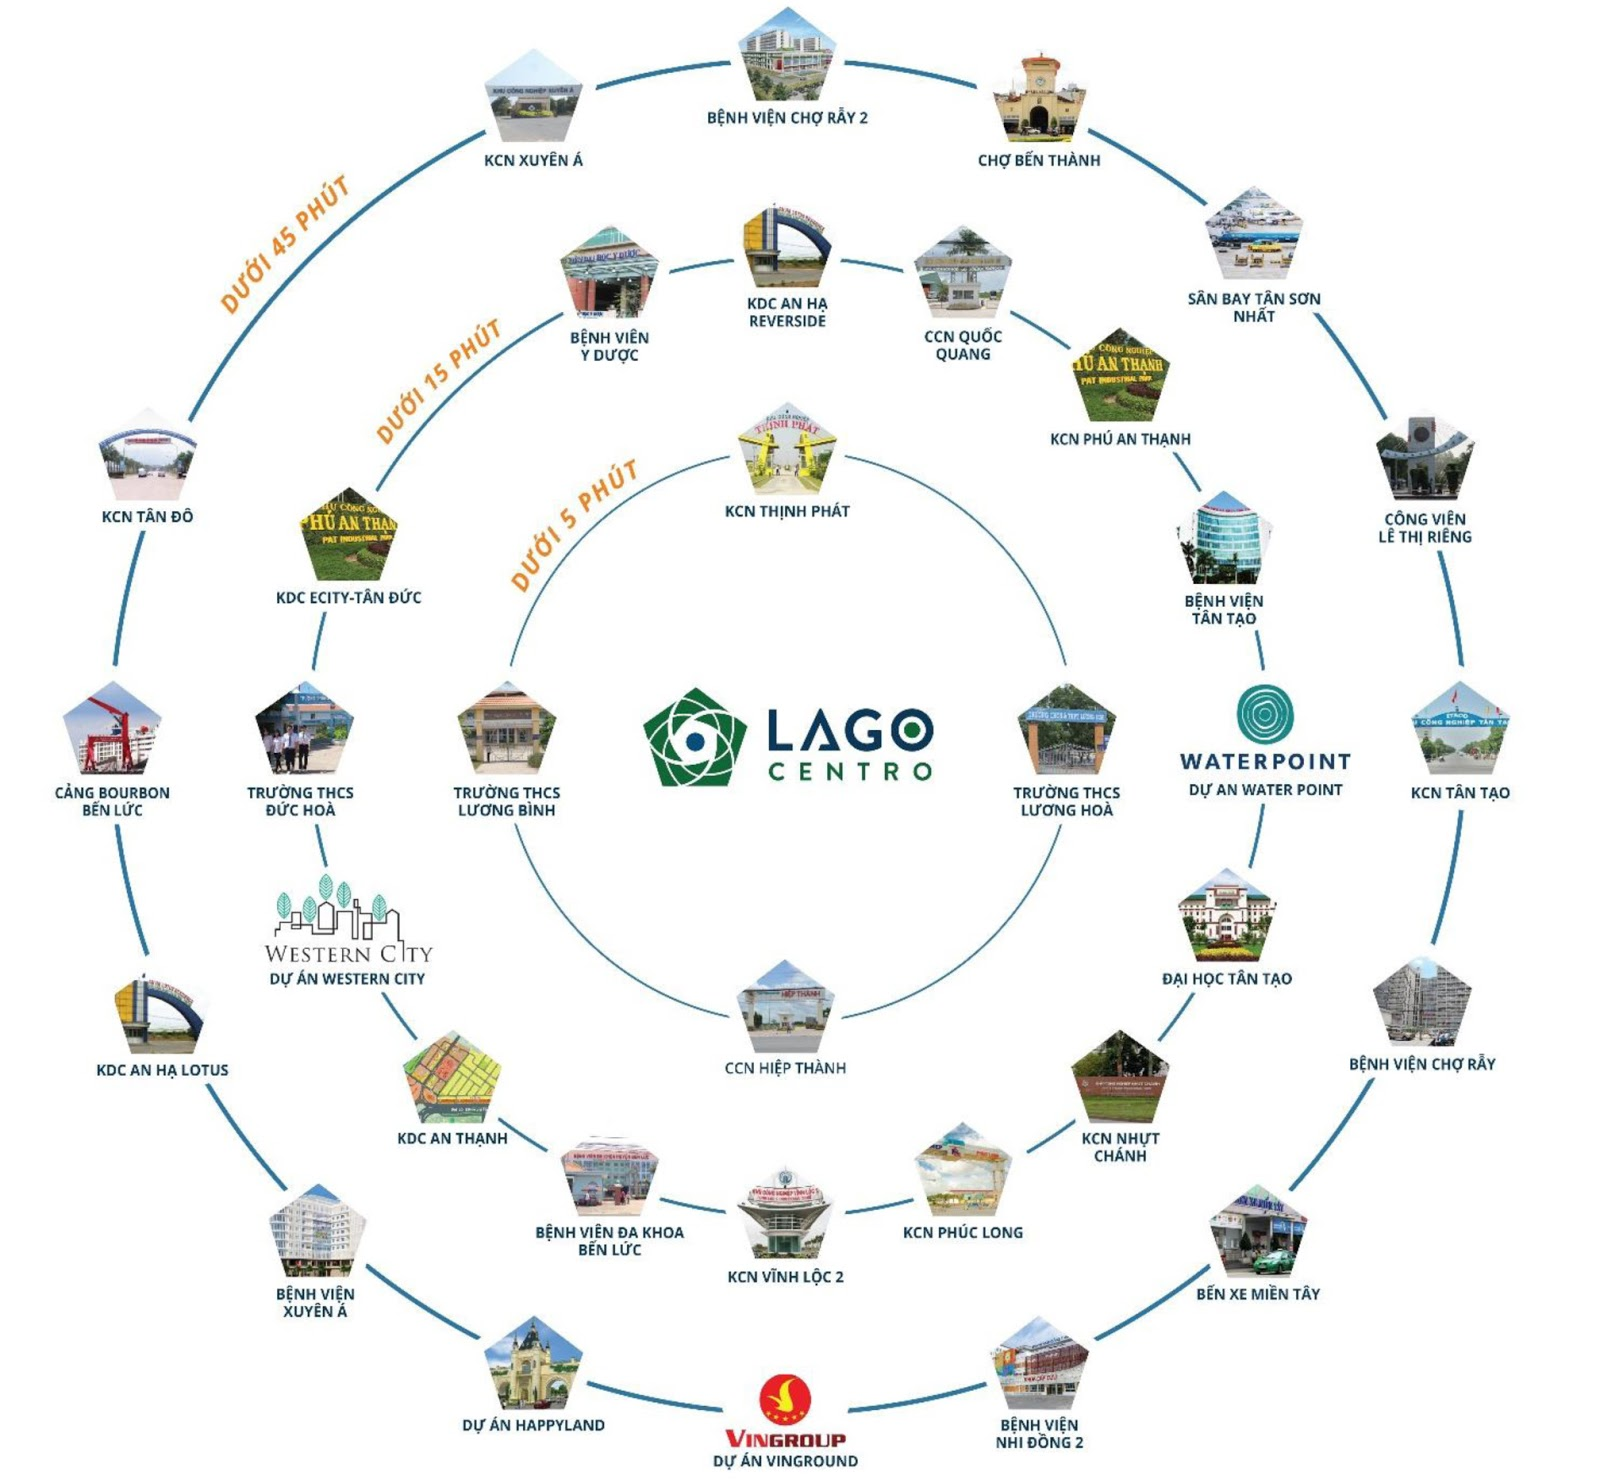 Bản đồ vị trí LAGO CENTRO